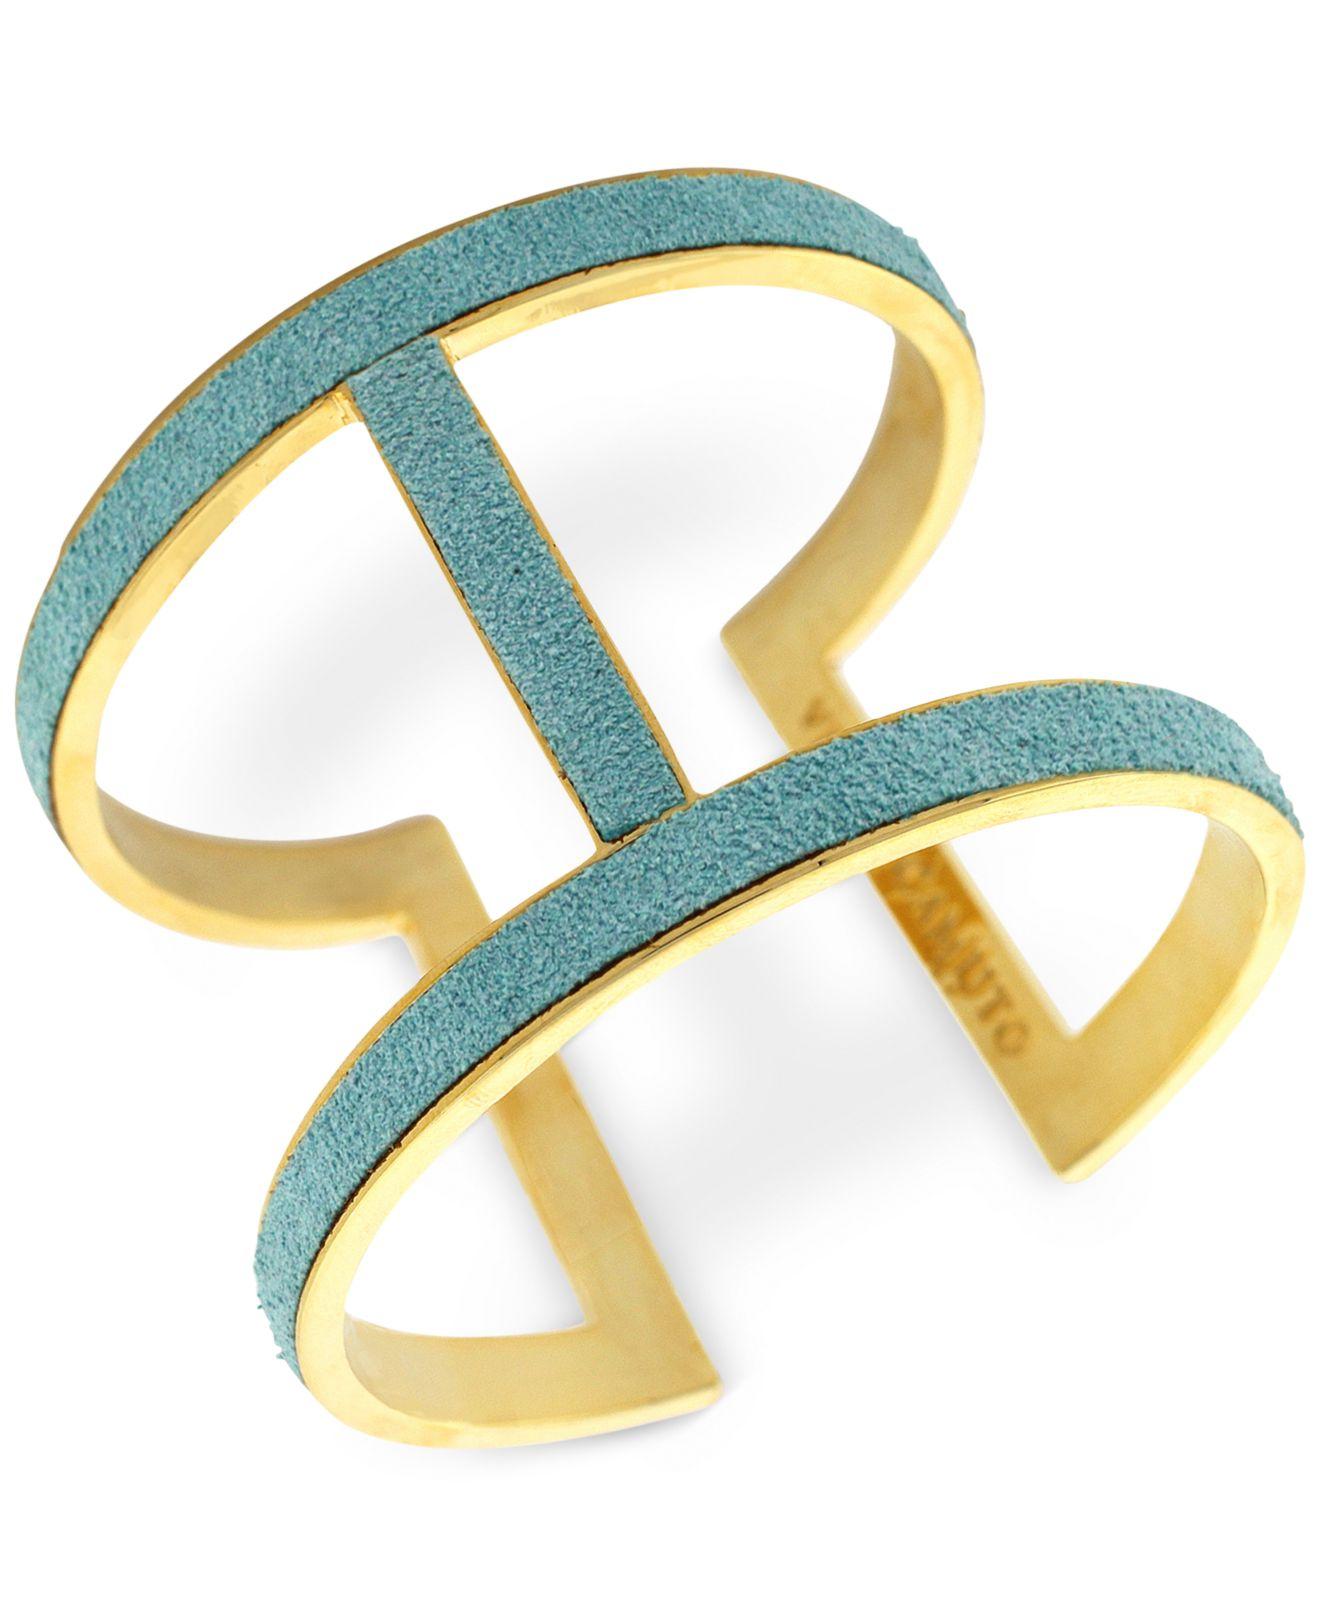 e7adaa86f73 Lyst - Vince Camuto Gold-Tone Suede Inlay T-Bar Cuff Bracelet in Blue